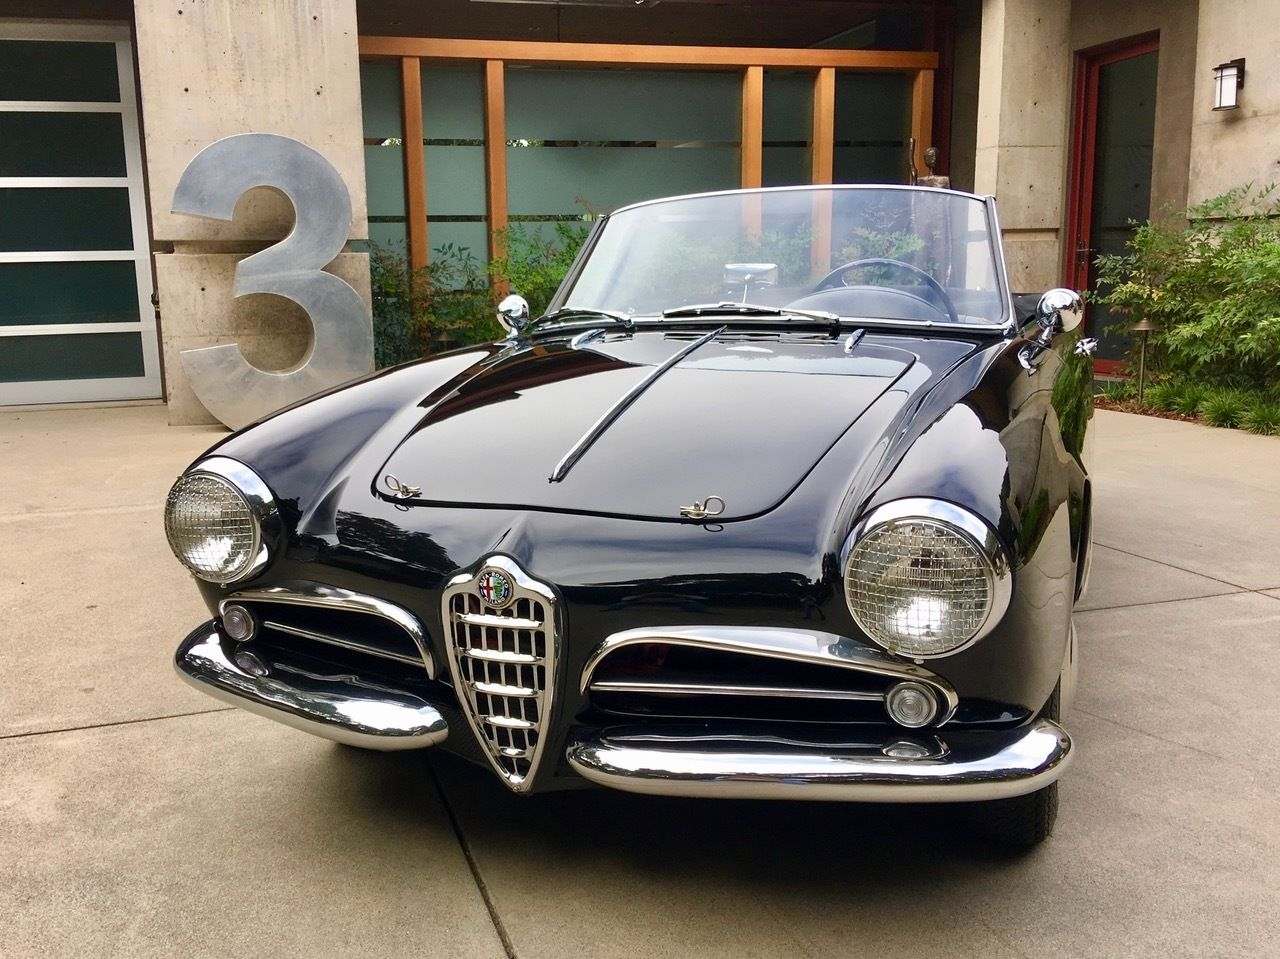 1958 alfa romeo giulietta 750 spider upgraded to veloce spec for sale. Black Bedroom Furniture Sets. Home Design Ideas